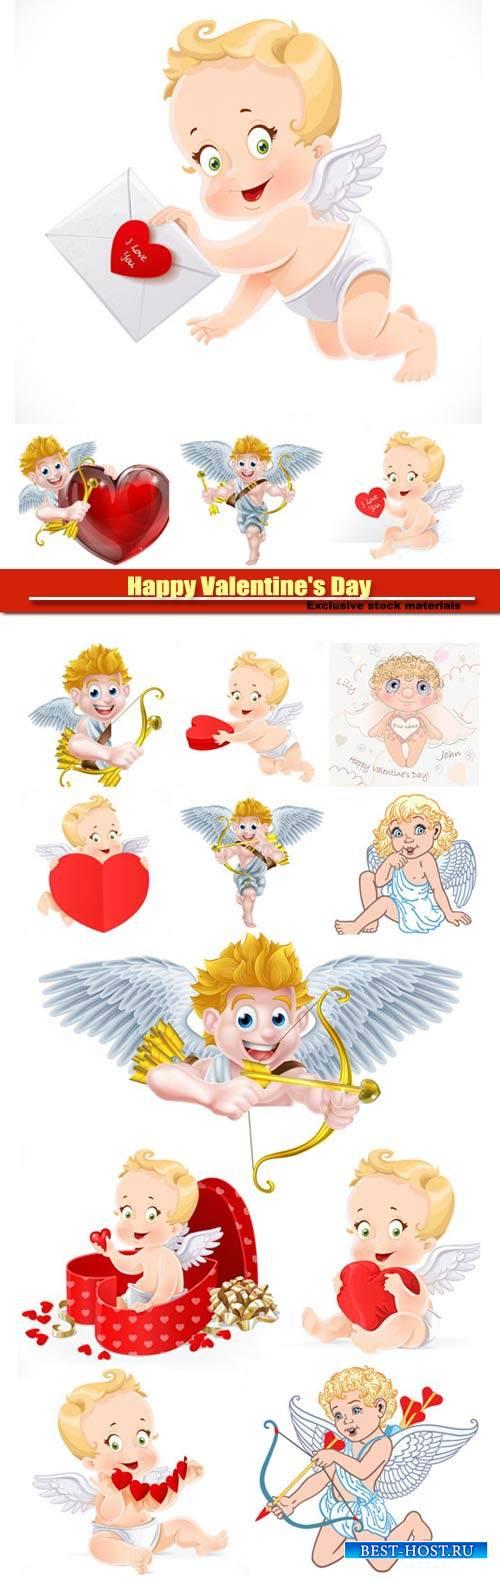 Happy Valentine's Day vector, hearts, romance, love, angels #7